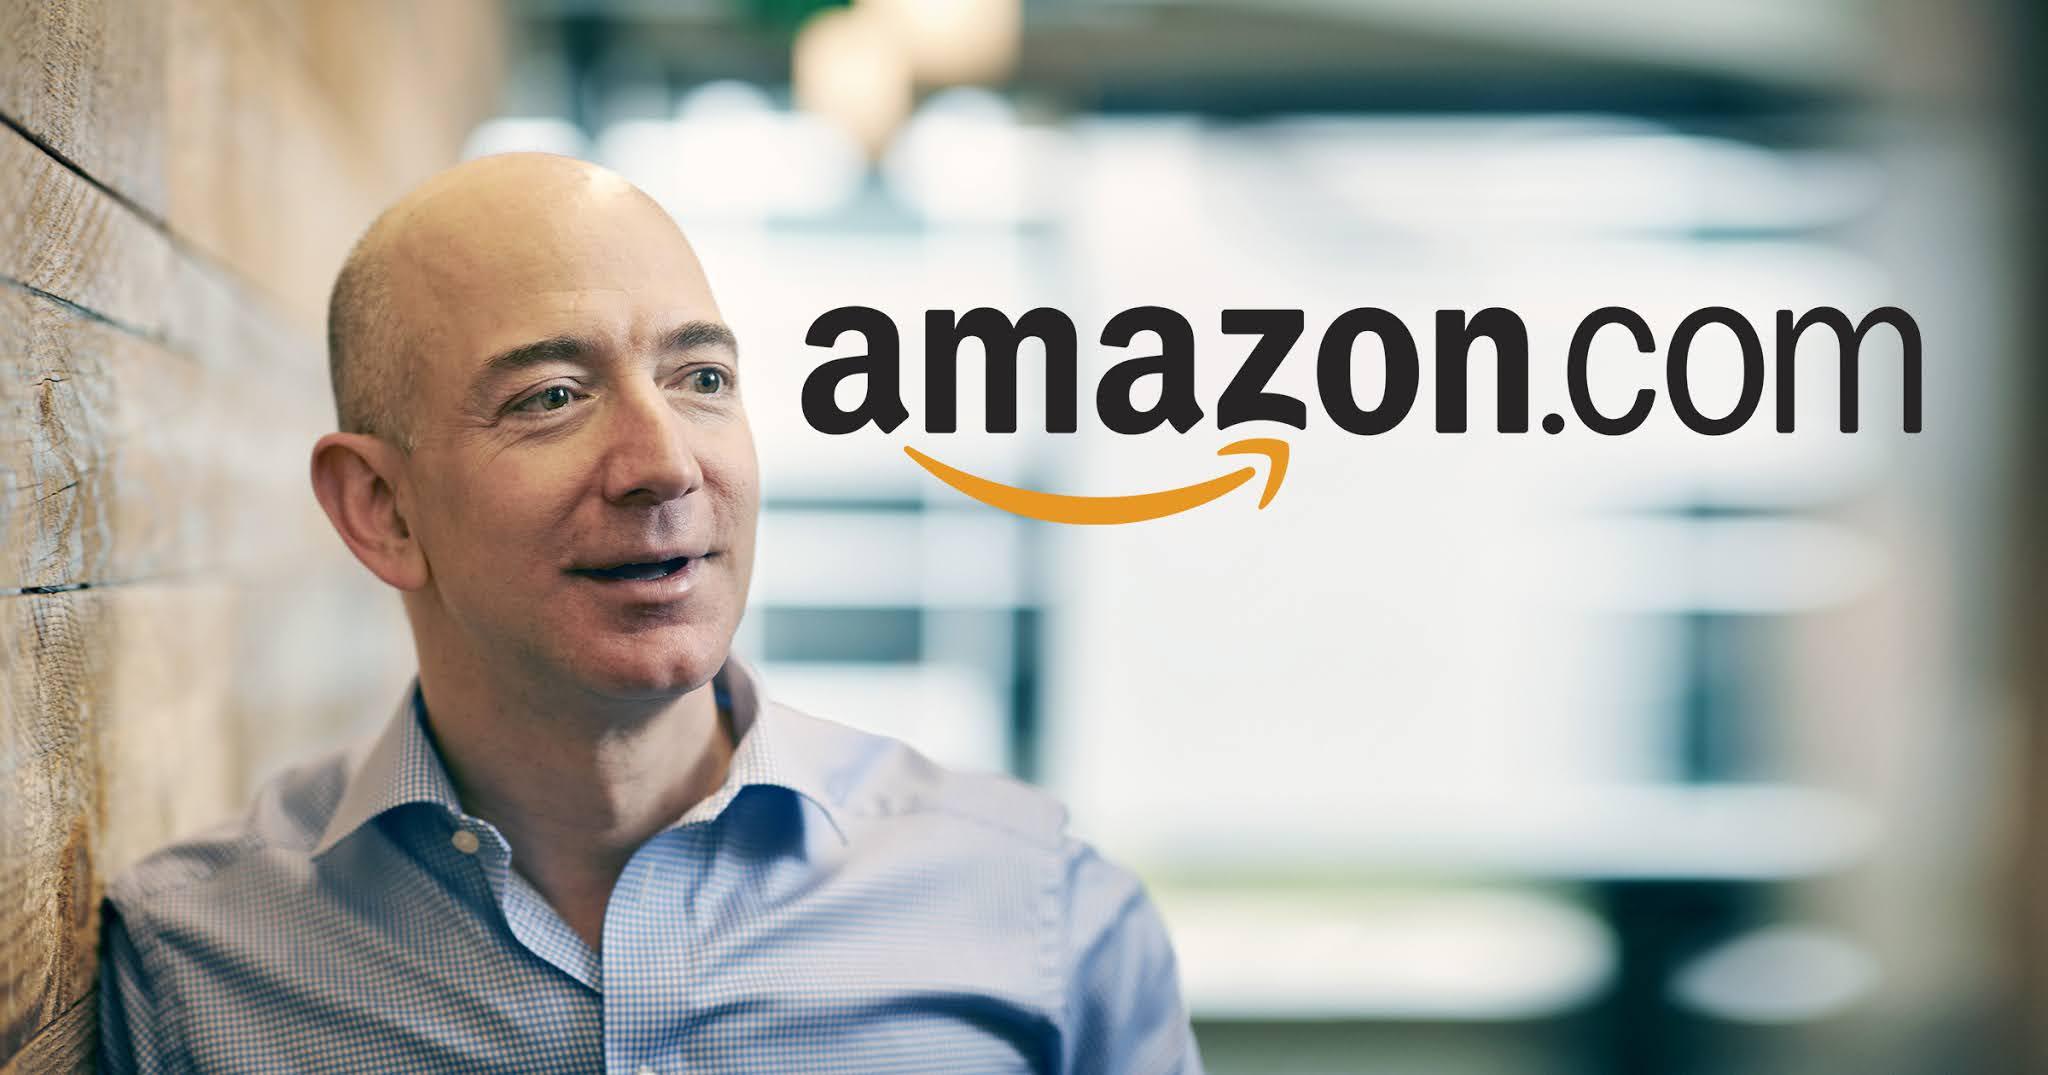 Jeff Bezos steps down as CEO of Amazon